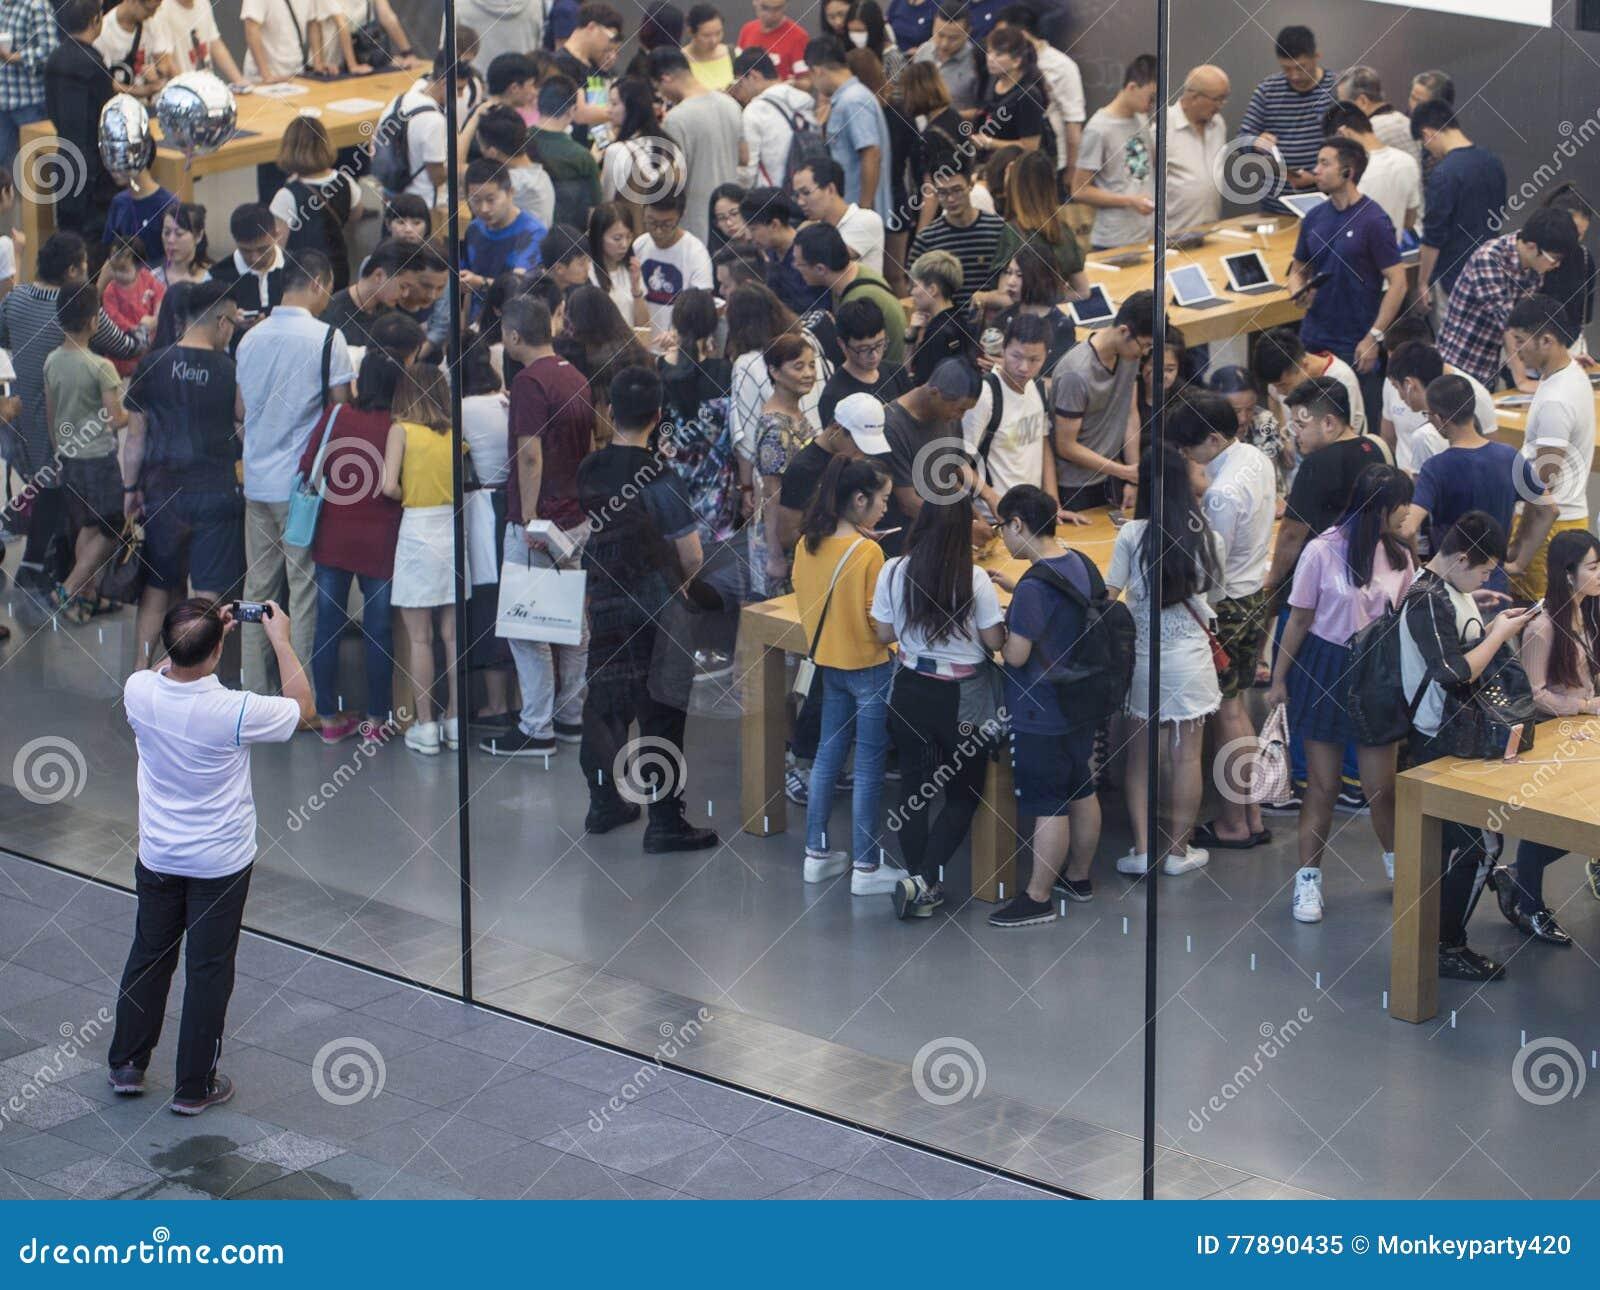 Apple Store Ocupado Imagen editorial